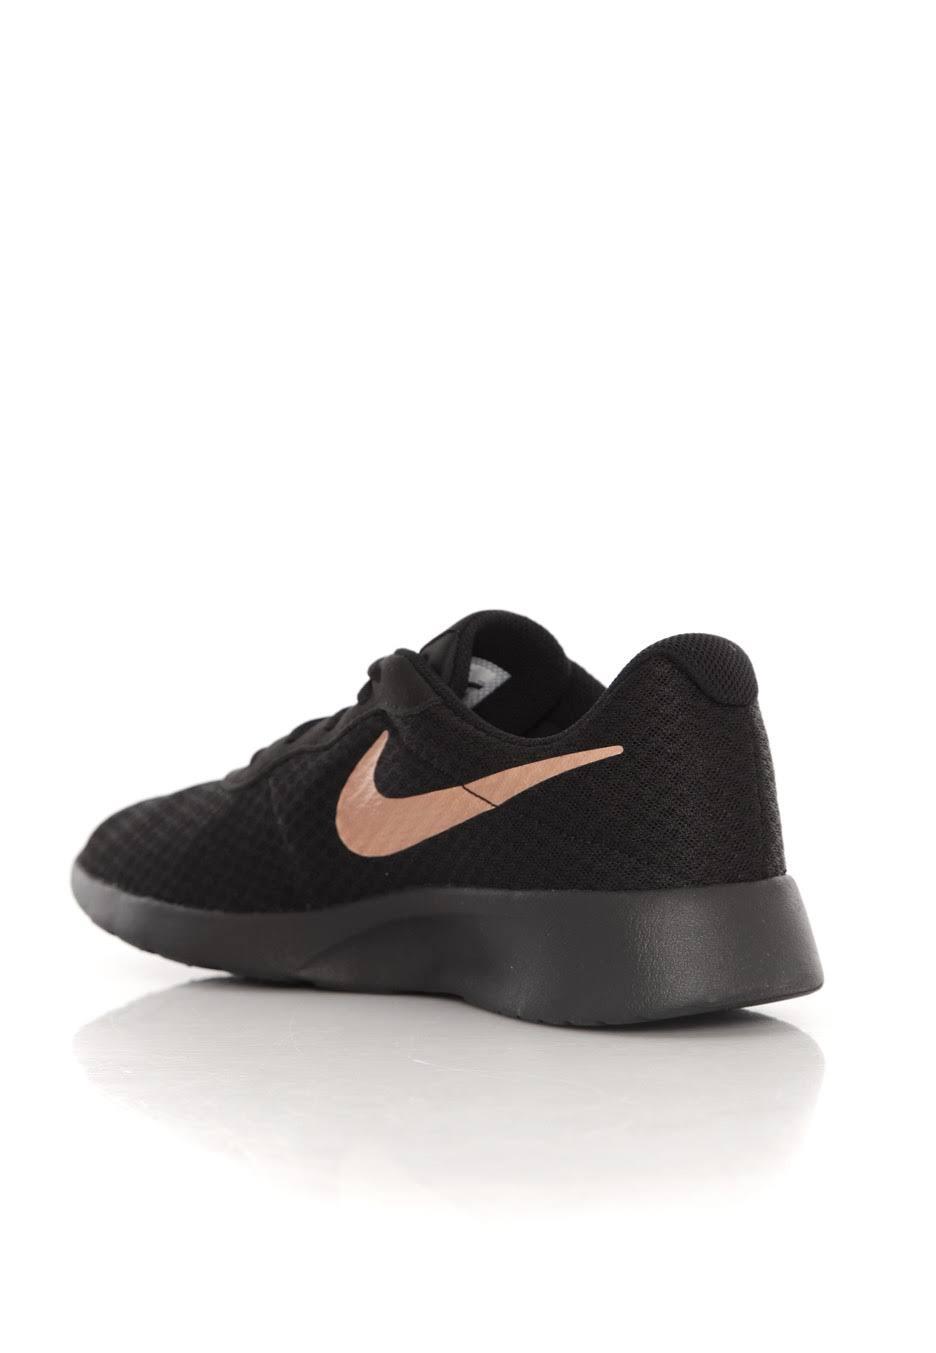 Nike - Tanjun Black/Metallic Red Bronze - Sneakers